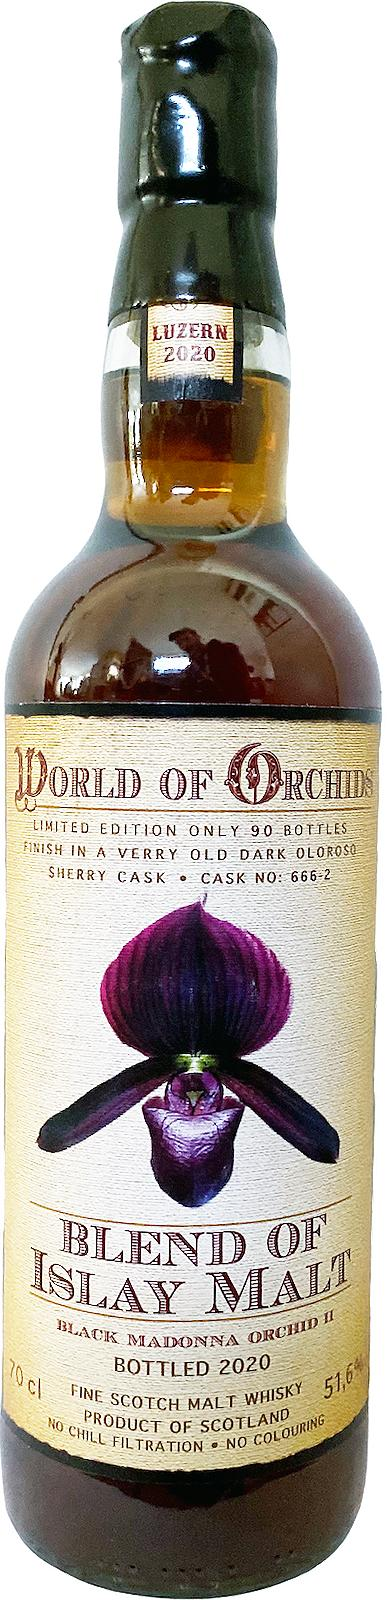 Blend of Islay Malt Black Madonna Orchid II JW